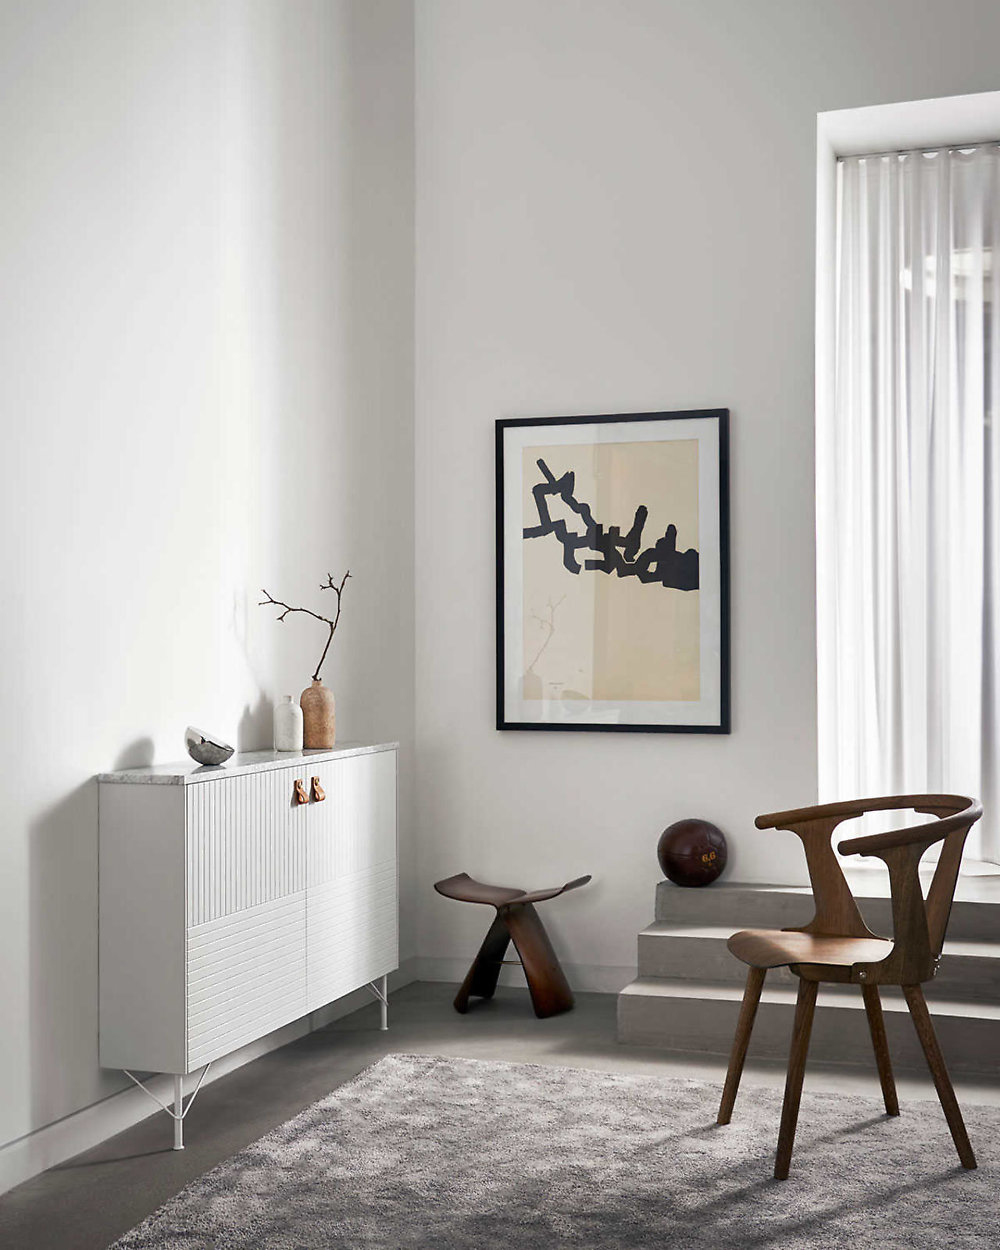 Inspiration for Superfront sideboards Room interior